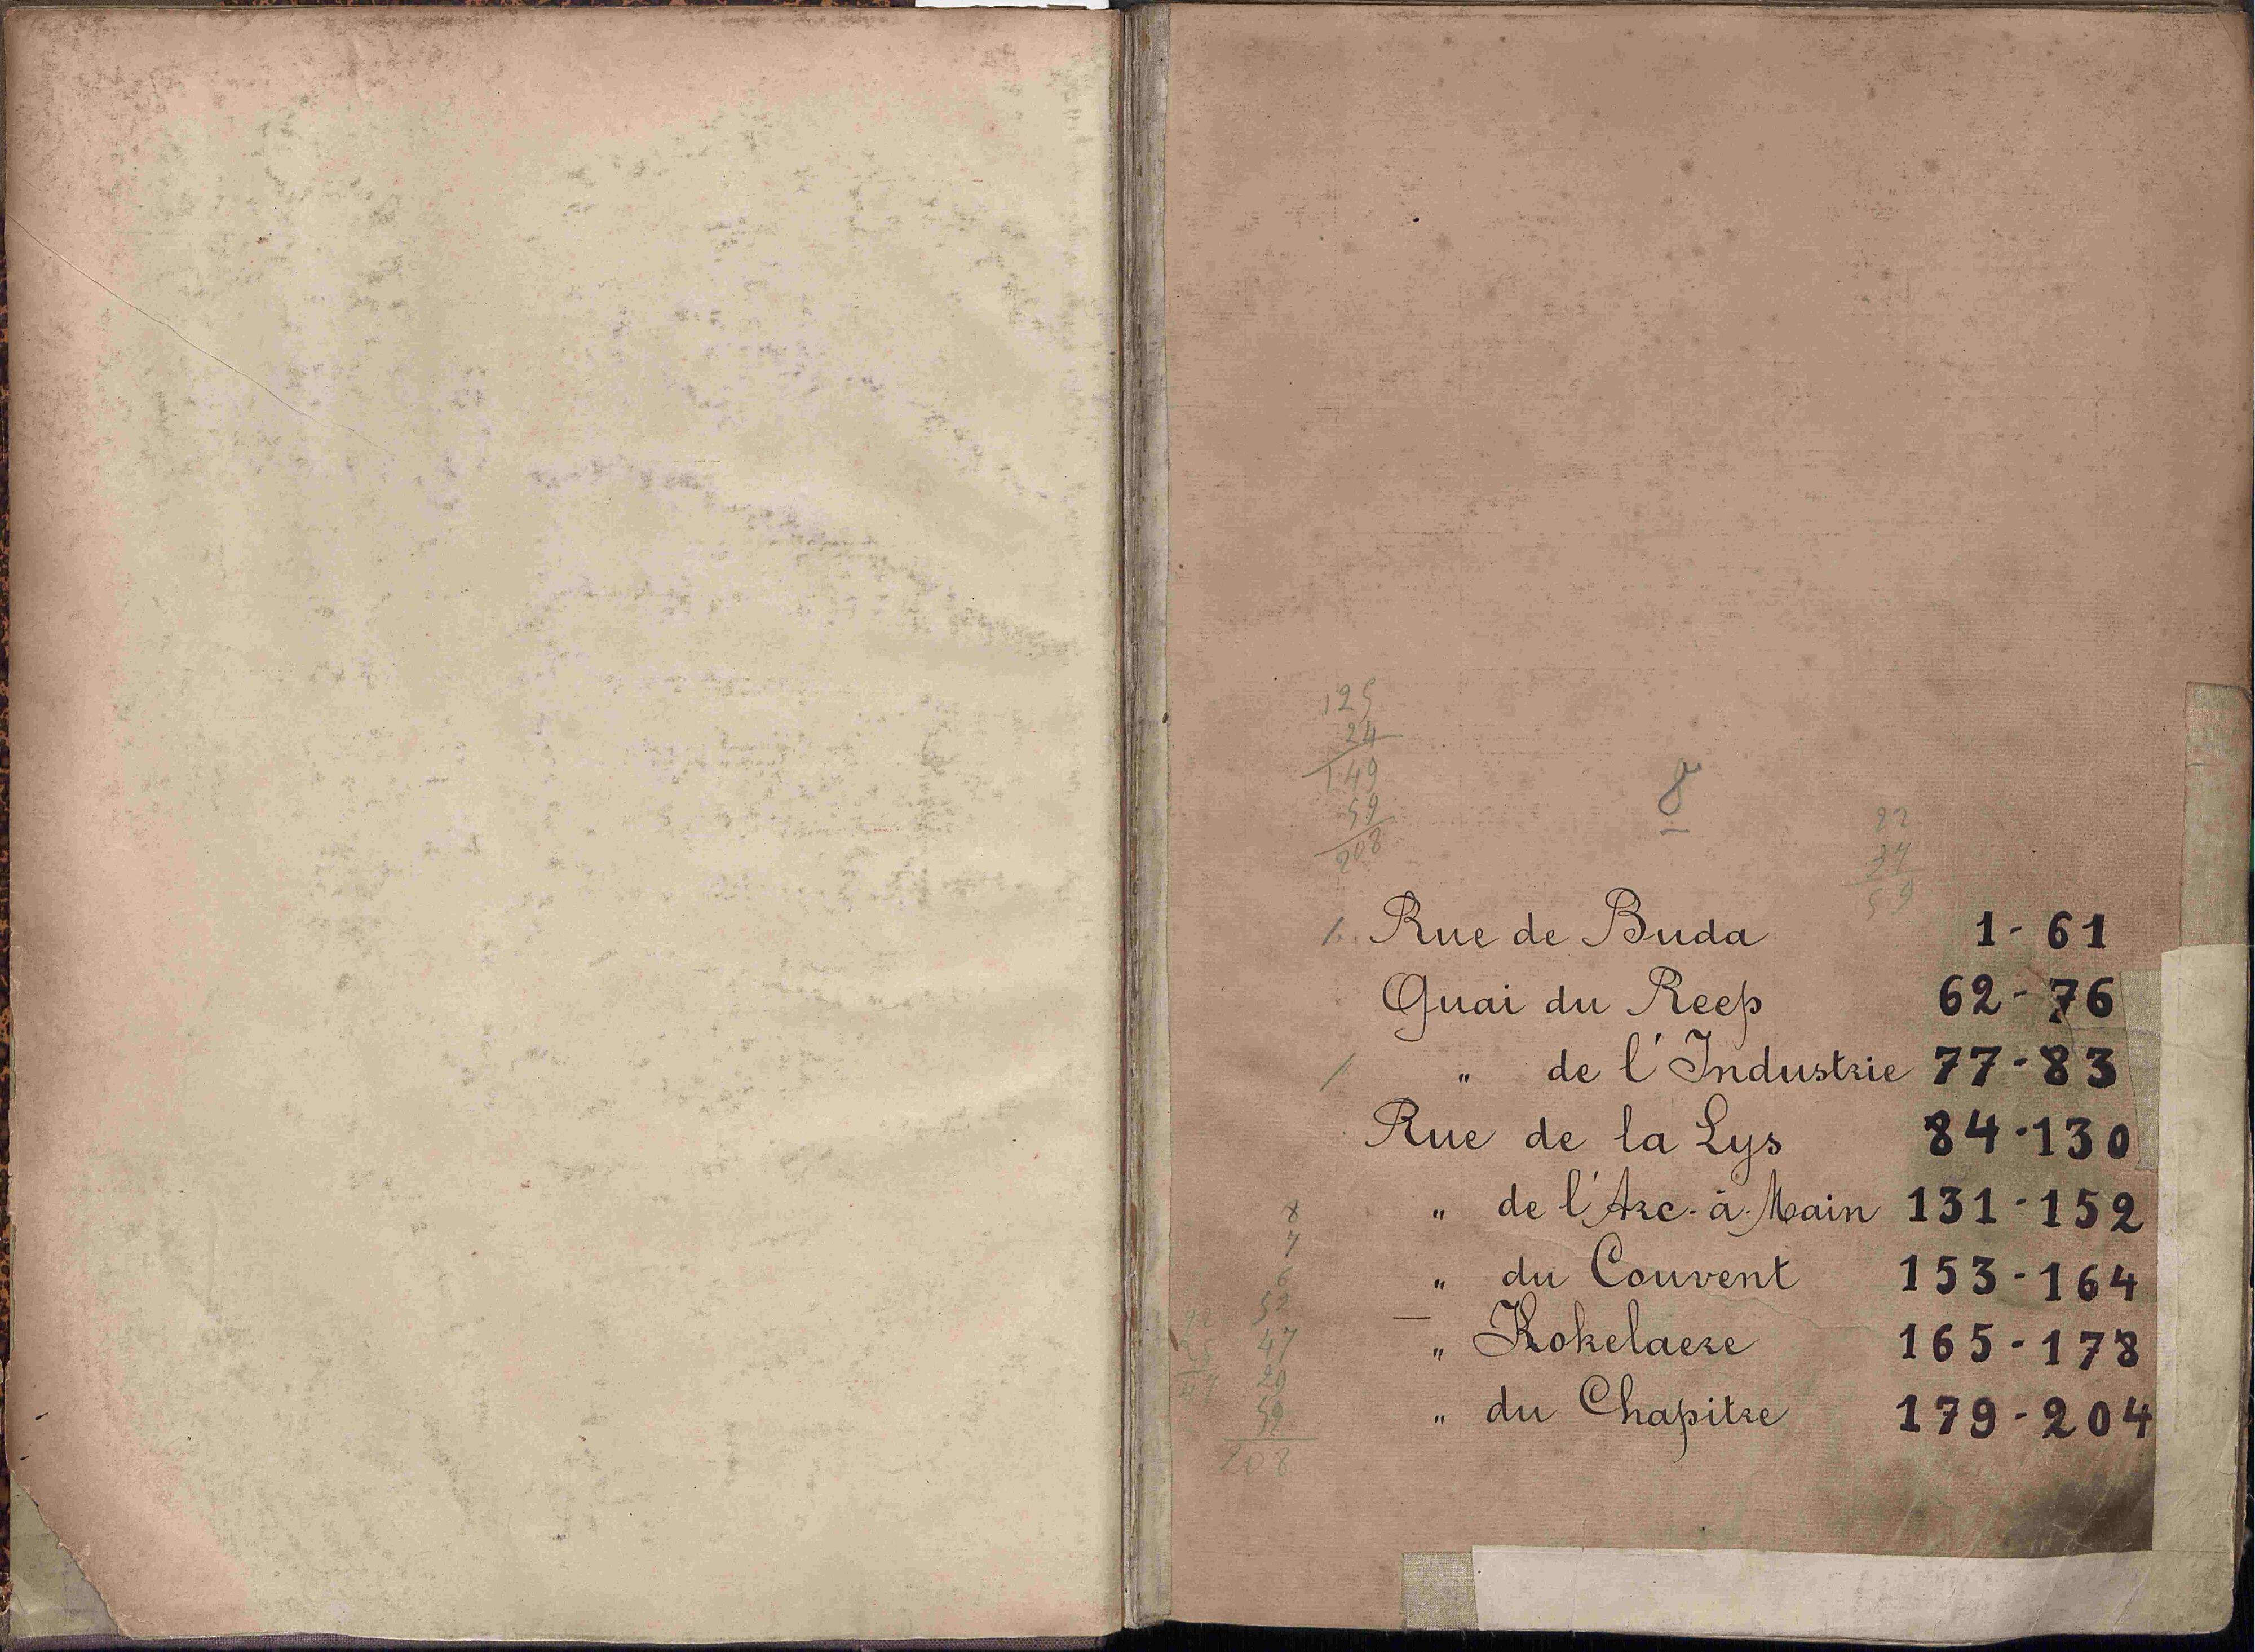 Bevolkingsregister Kortrijk 1890 boek 8